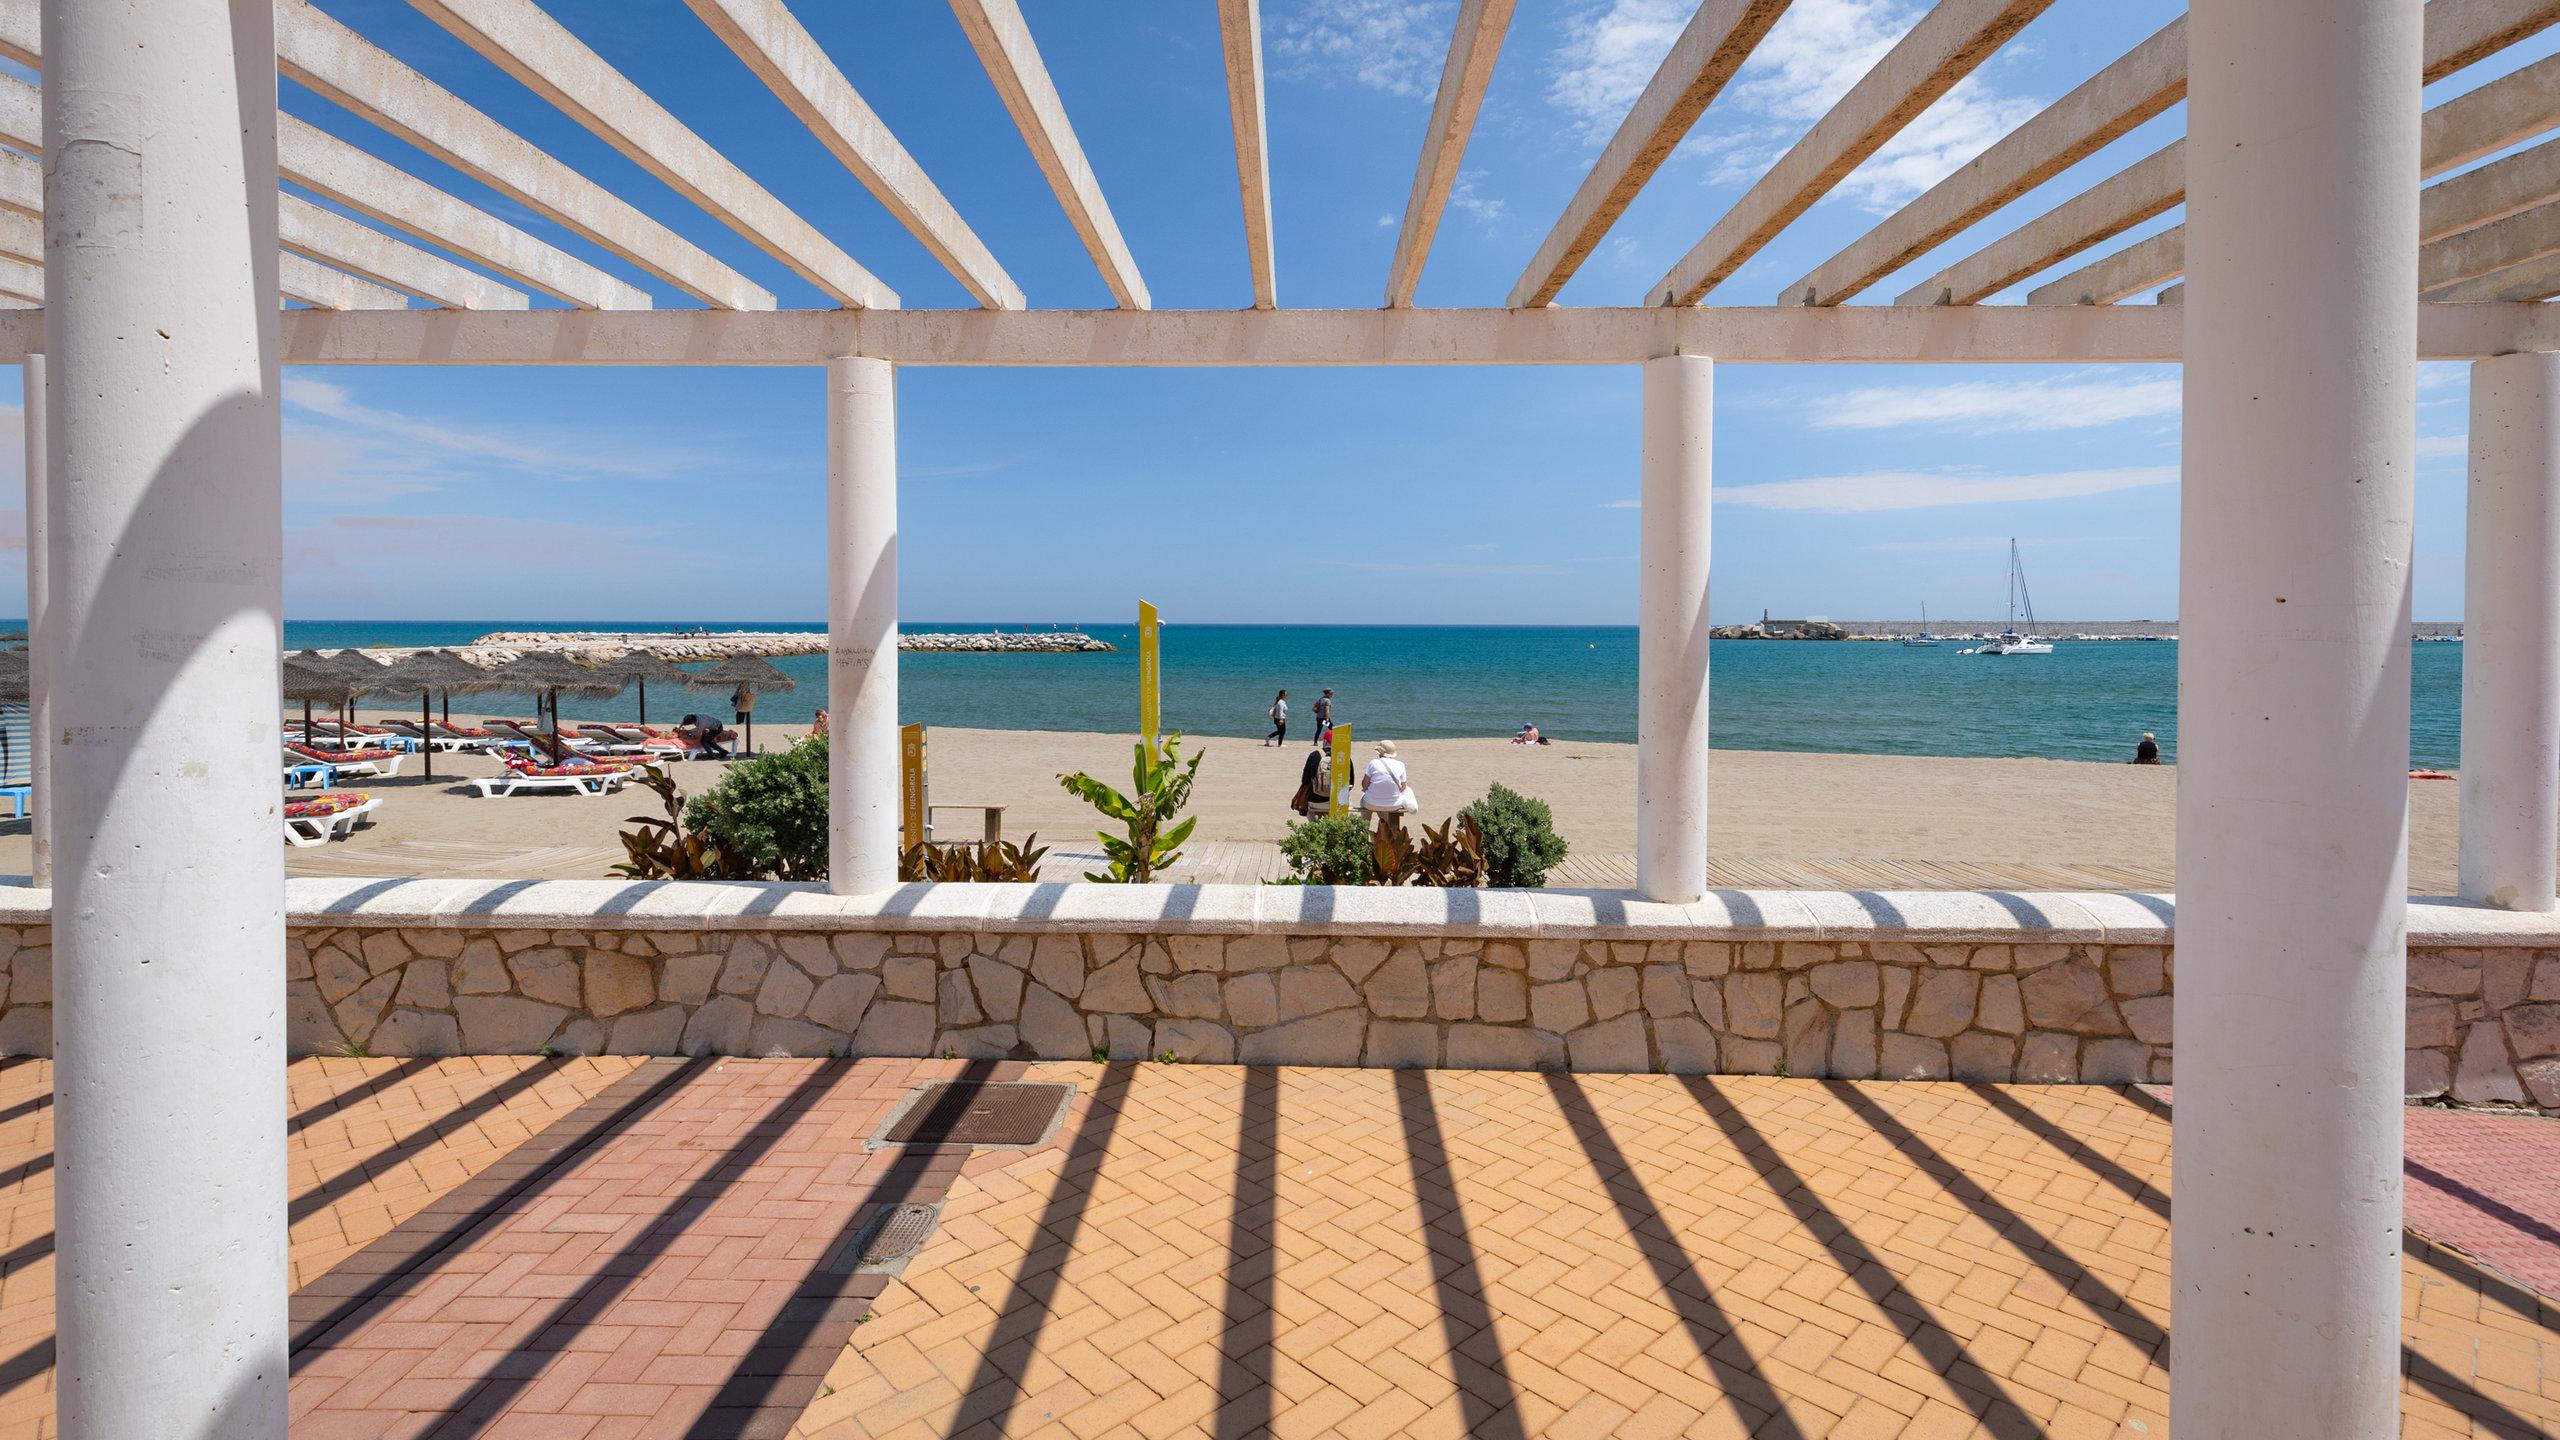 Playa de Los Boliches, Fuengirola, Andalucía, España